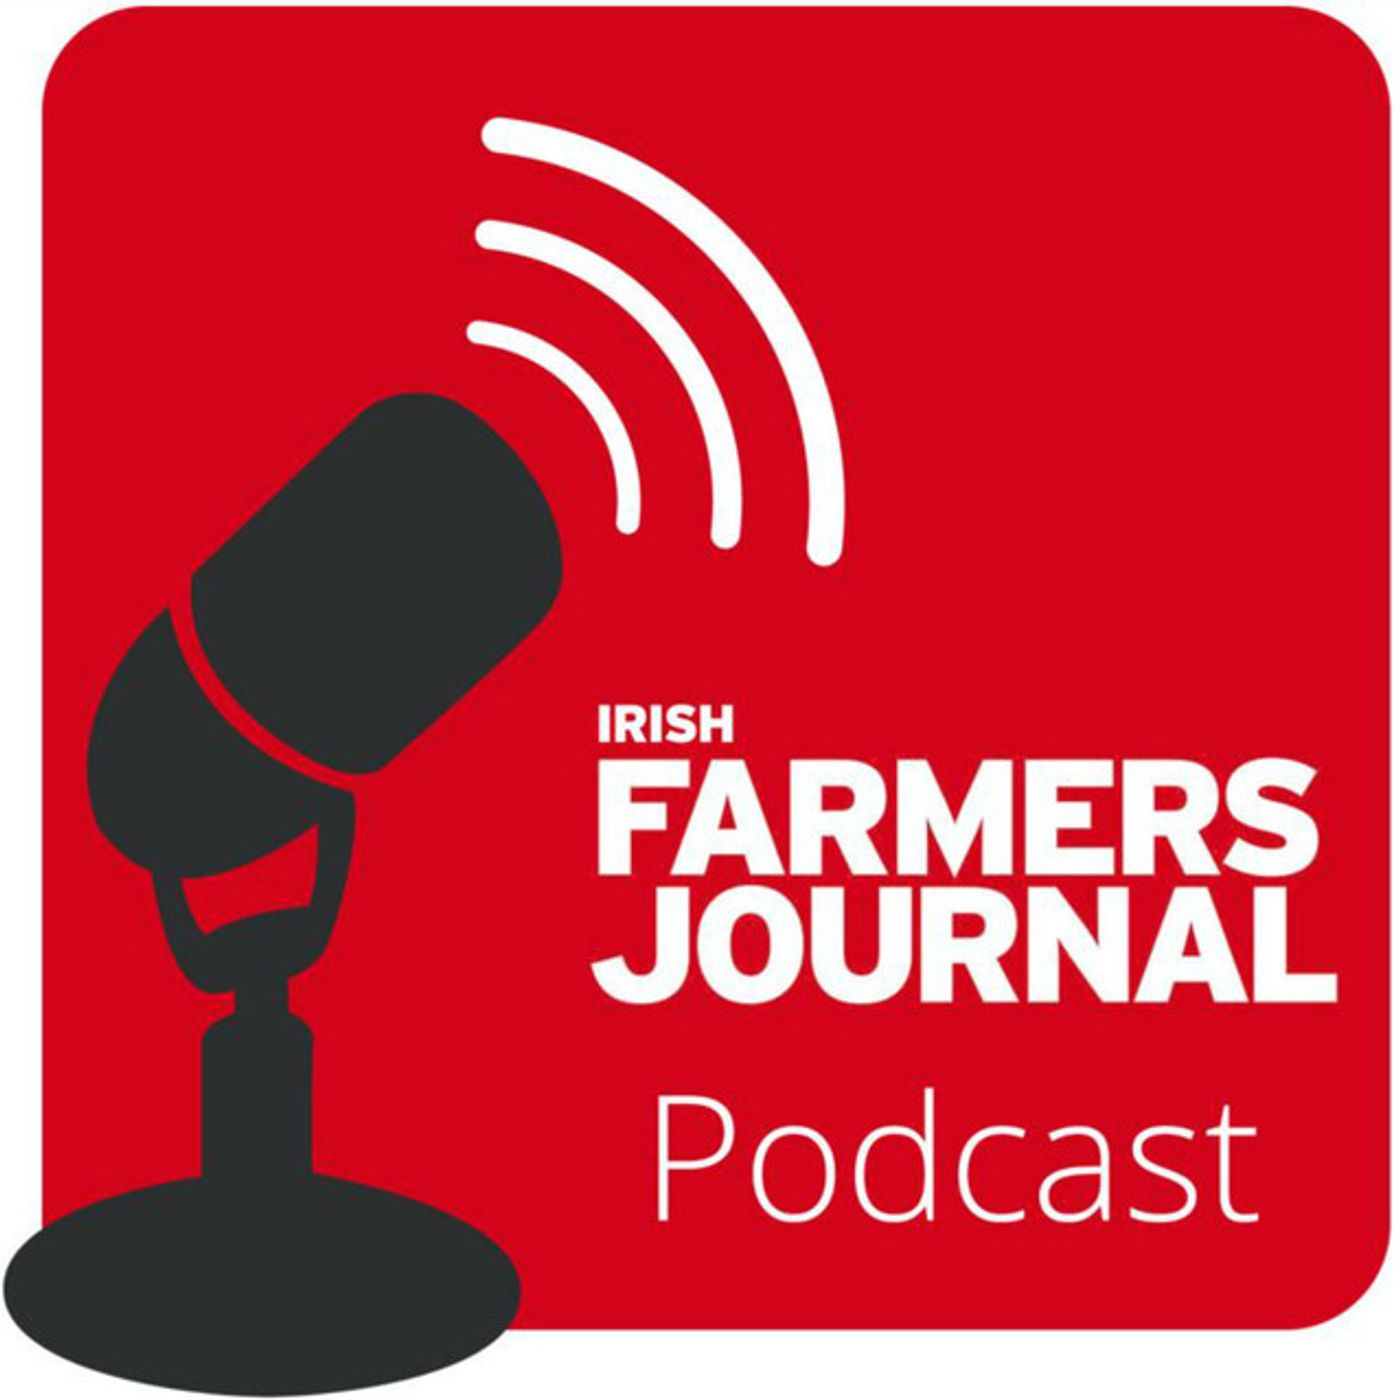 Irish Farmers Journal podcast items